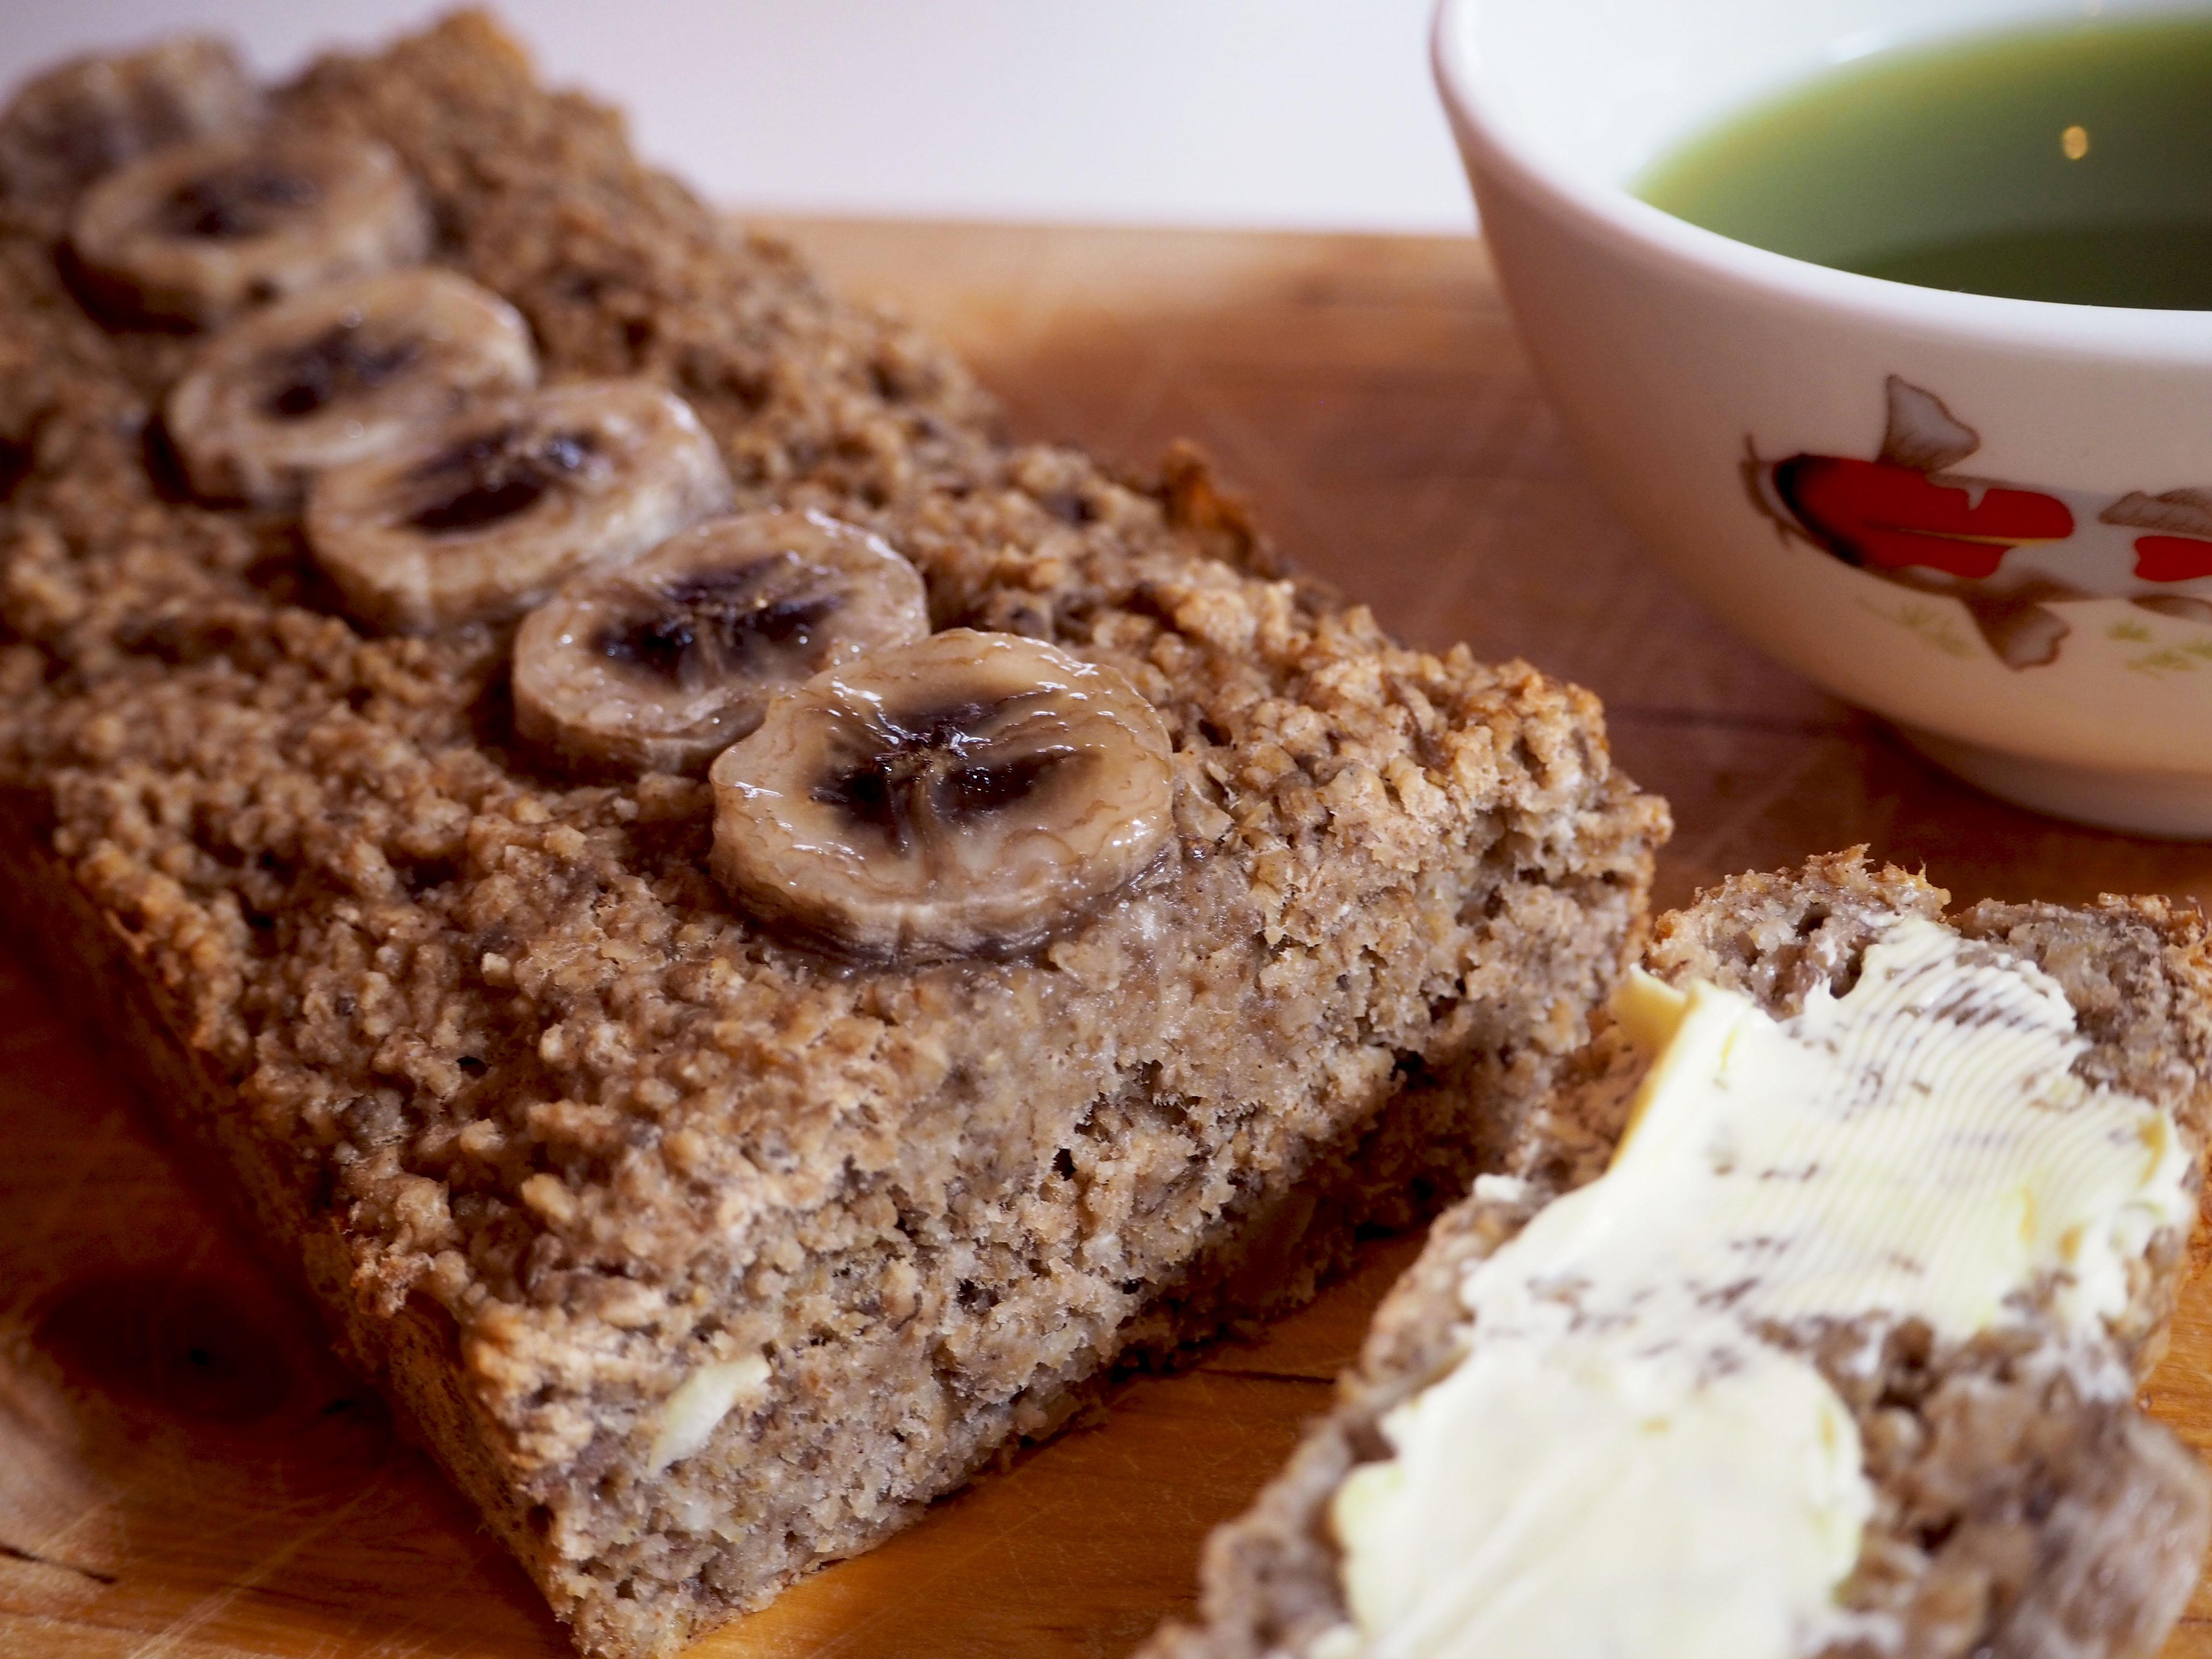 vegan bananenbrood met havermout